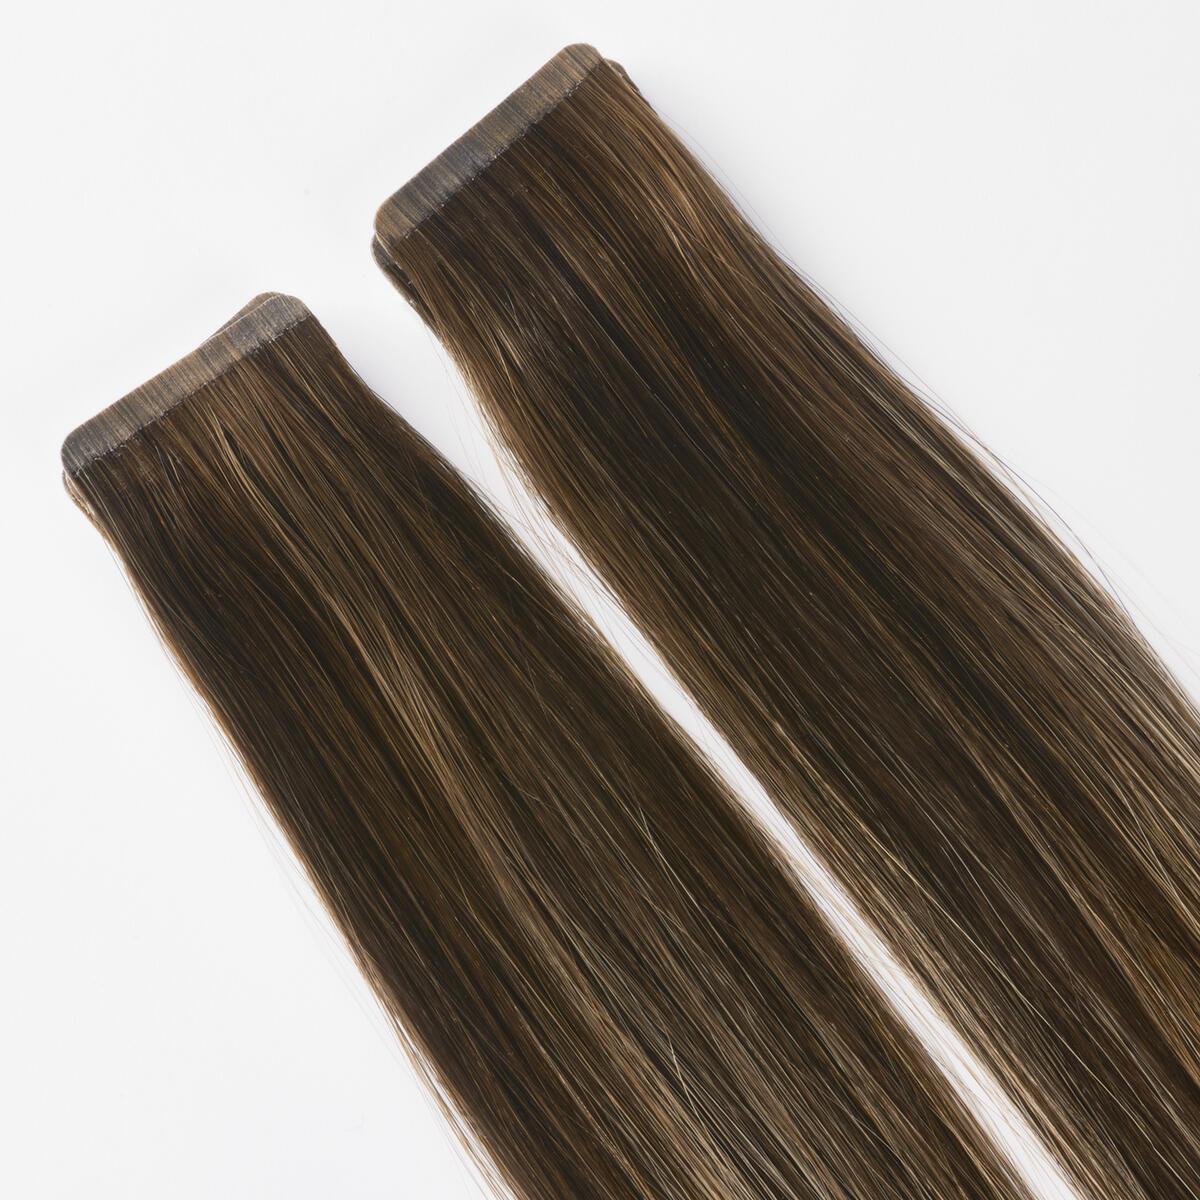 Sleek Tape Extension Premium B2.3/5.0 Hazelnut Caramel Balayage 50 cm